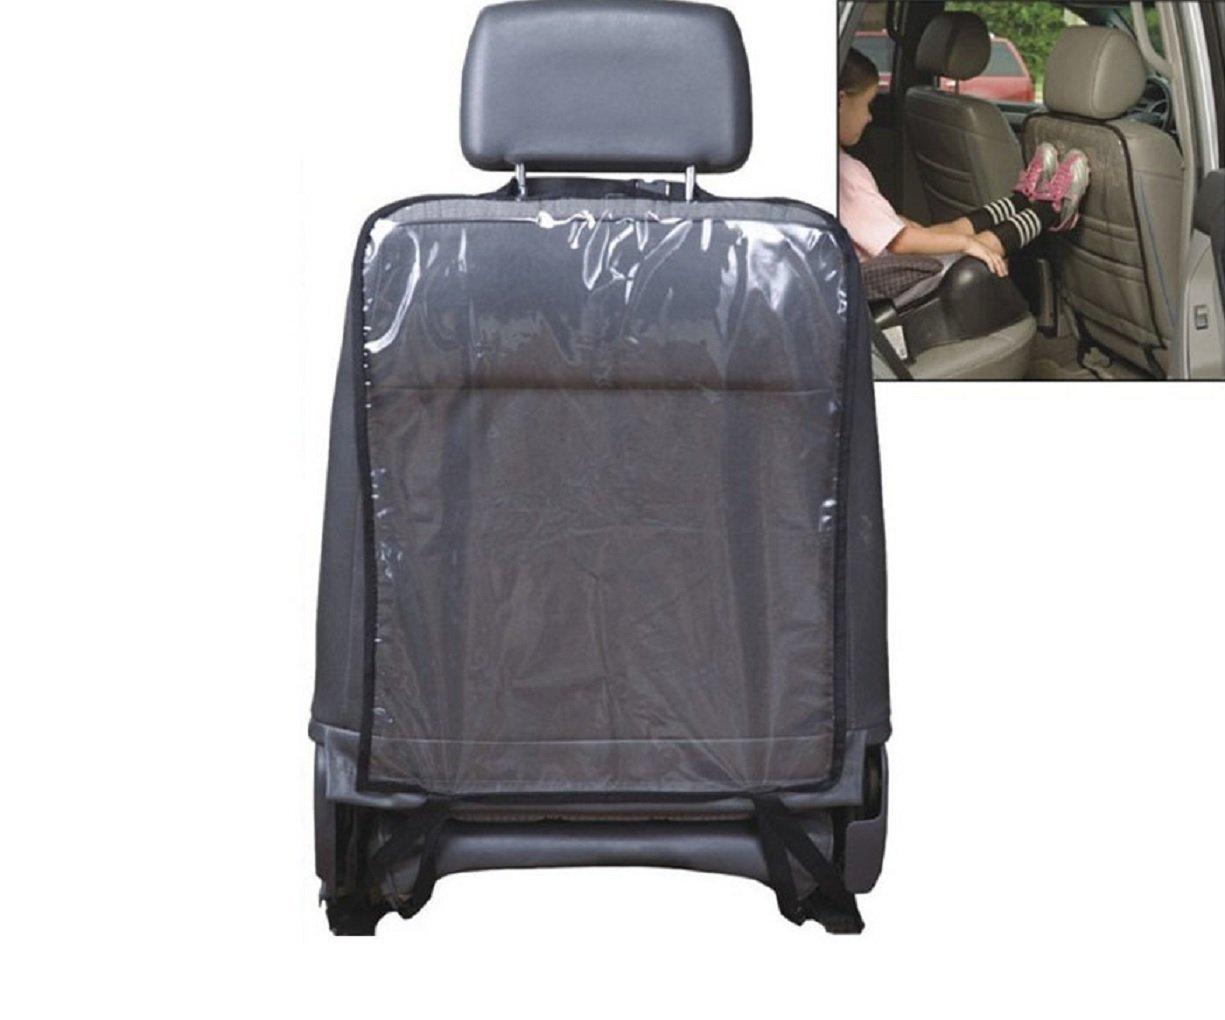 Funda transparente para asientos de coche dise/ño universal de Tily